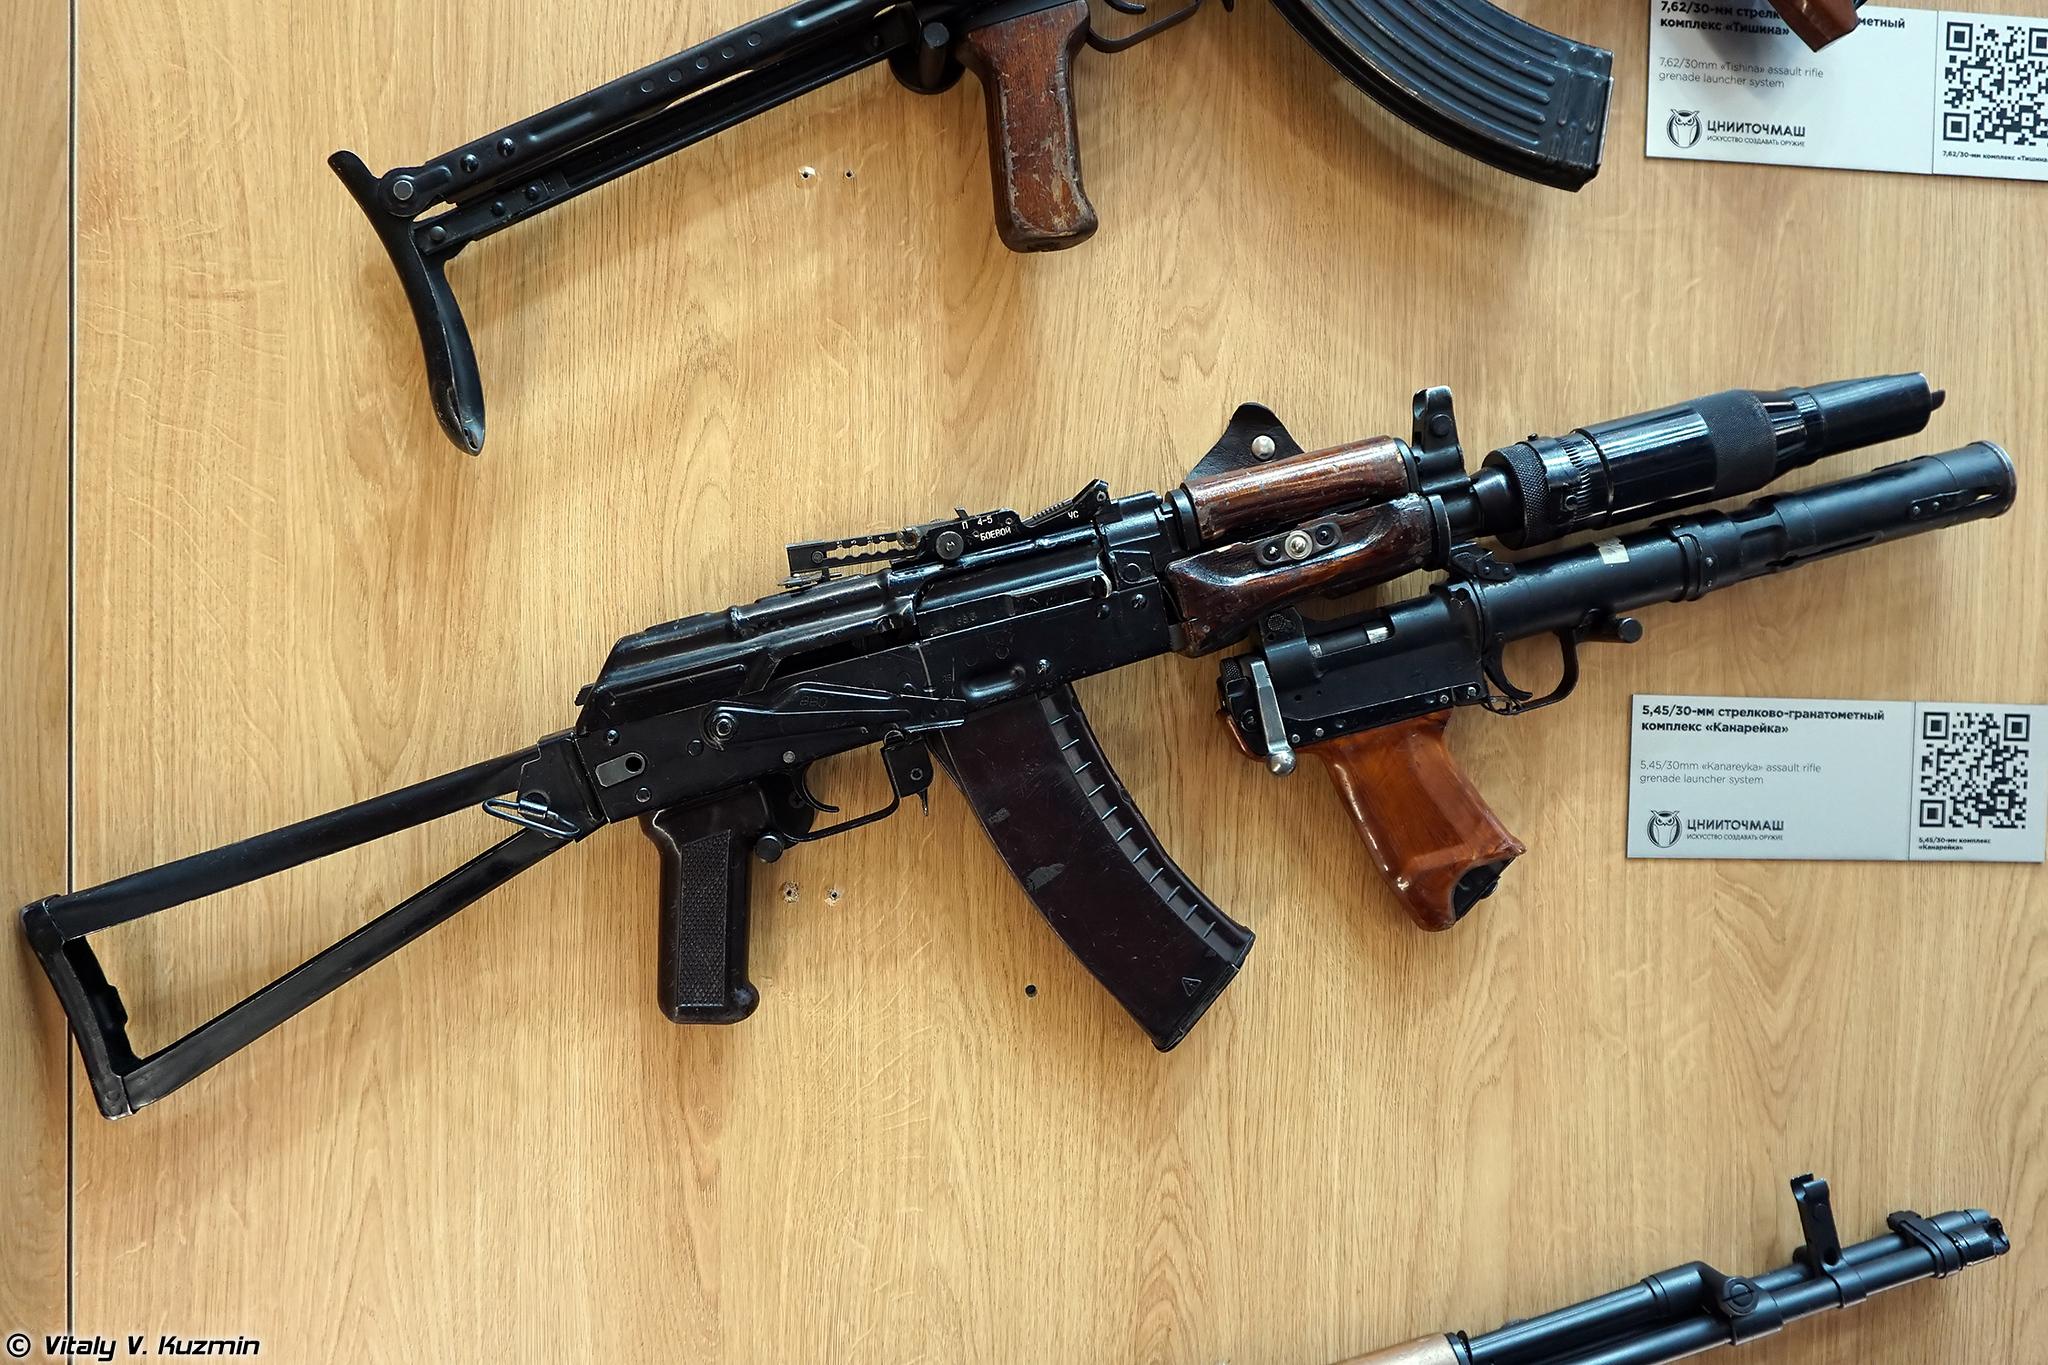 Russian Assault Rifles/Carbines/Machine Guns Thread: #2 - Page 10 Army-2020-Pavilions-045-X4